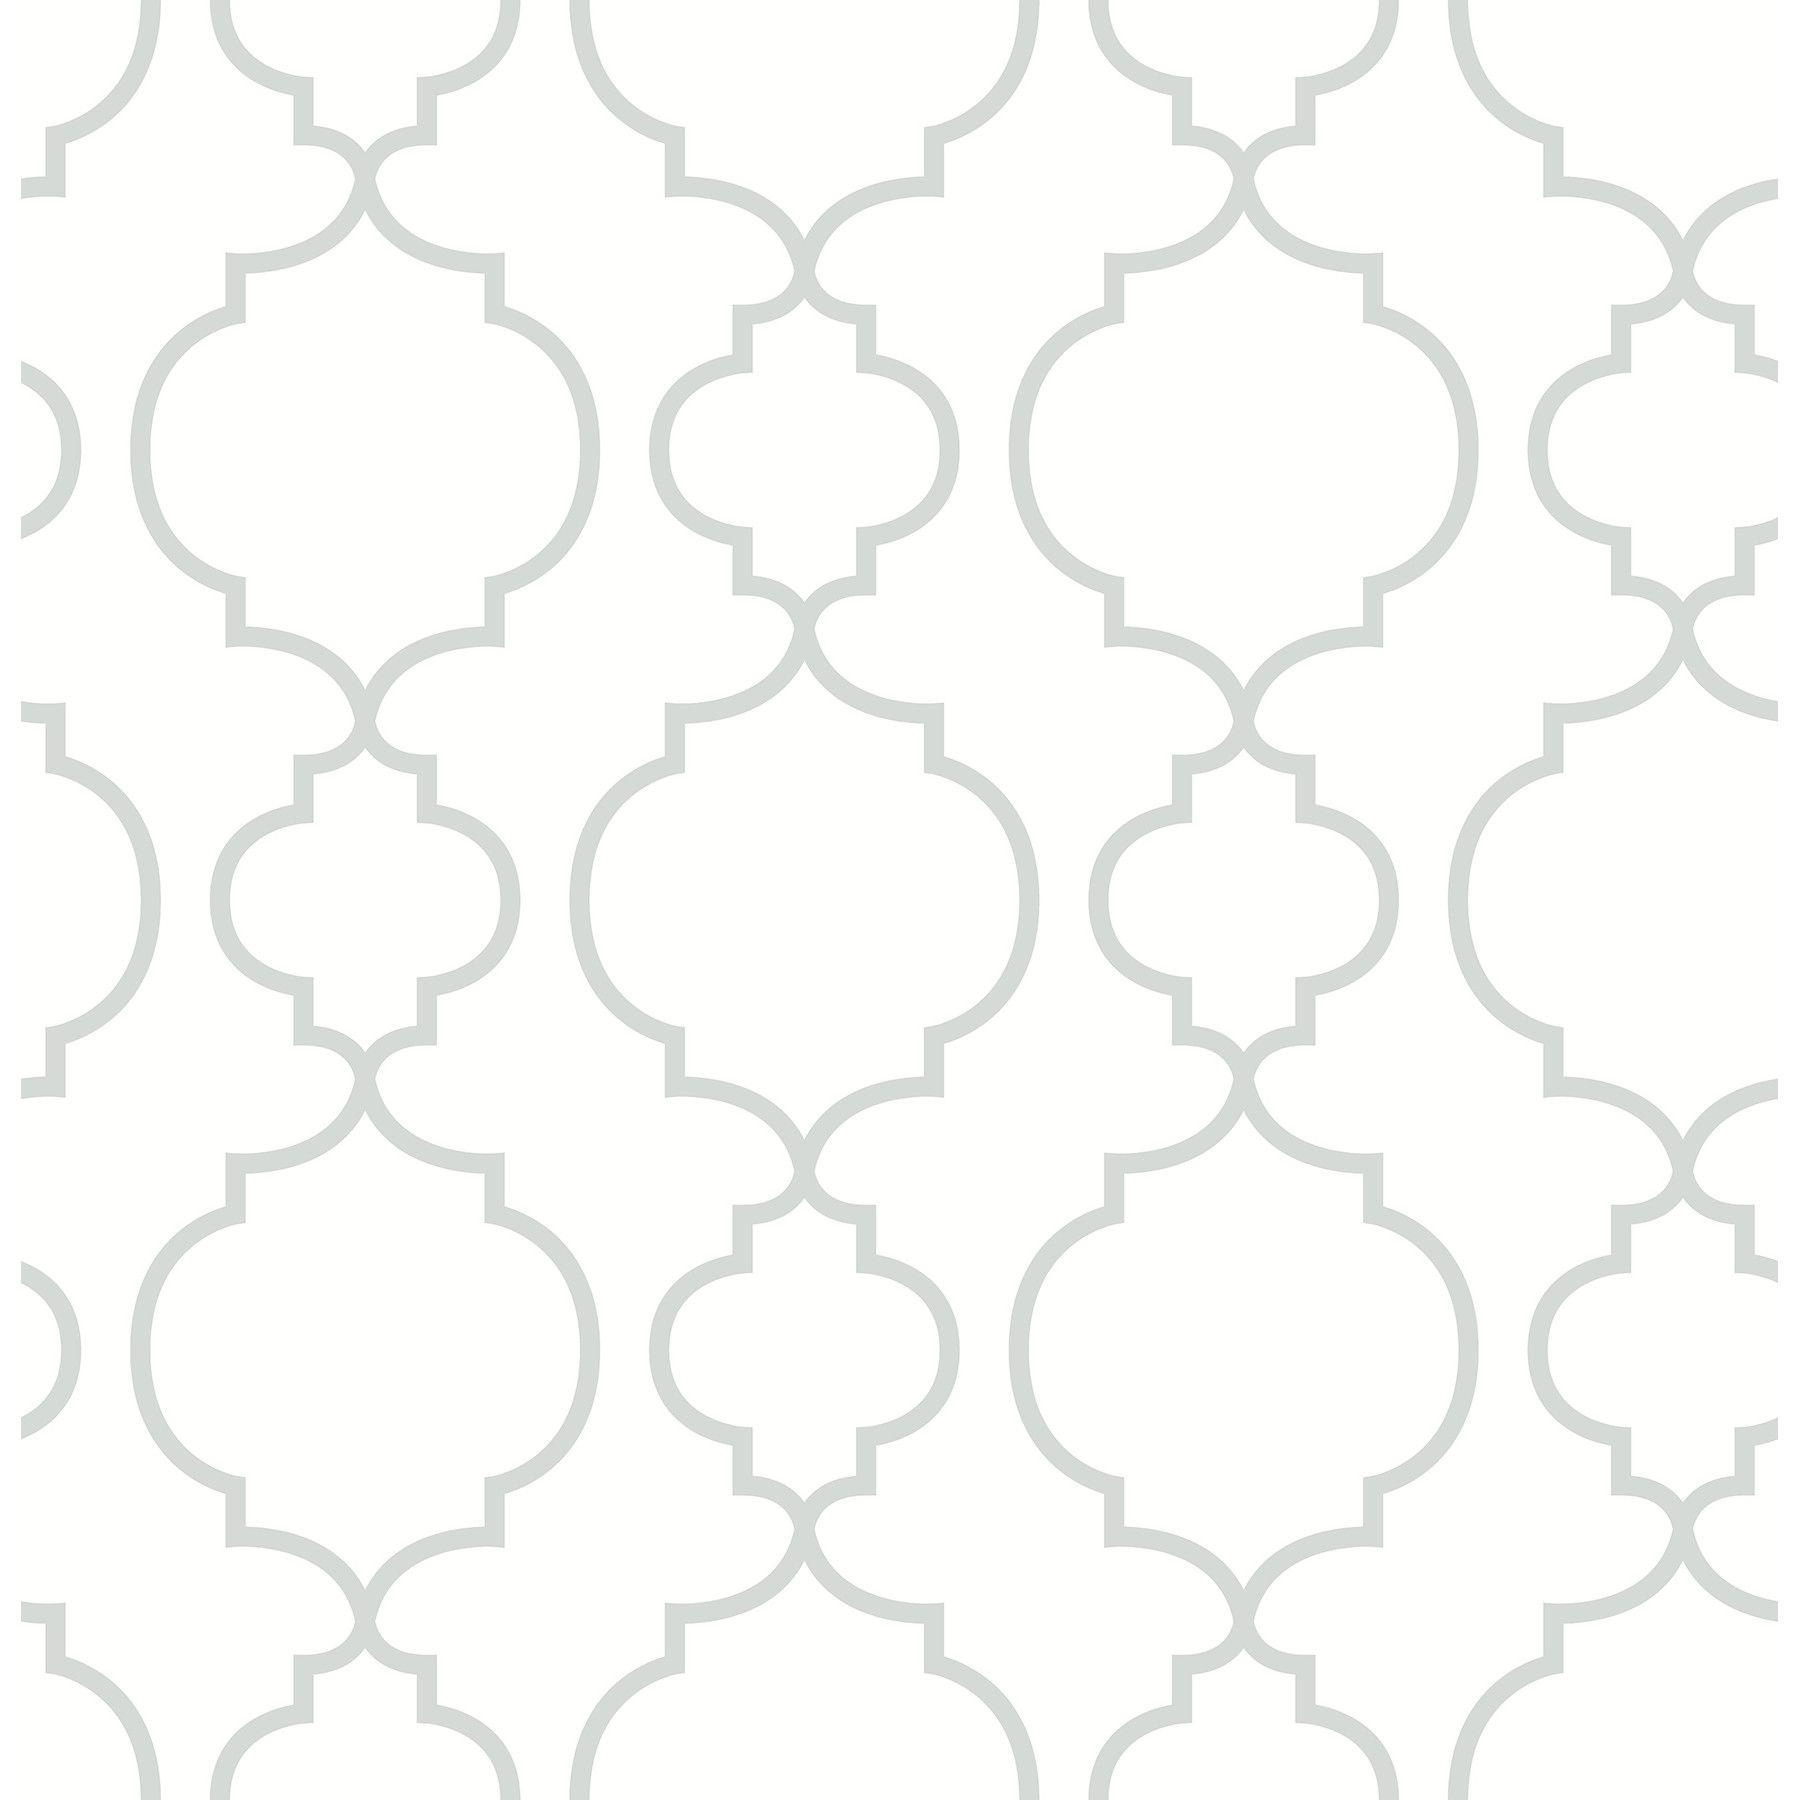 Customer Image Zoomed Quatrefoil Wallpaper Quatrefoil Trellis Wallpaper